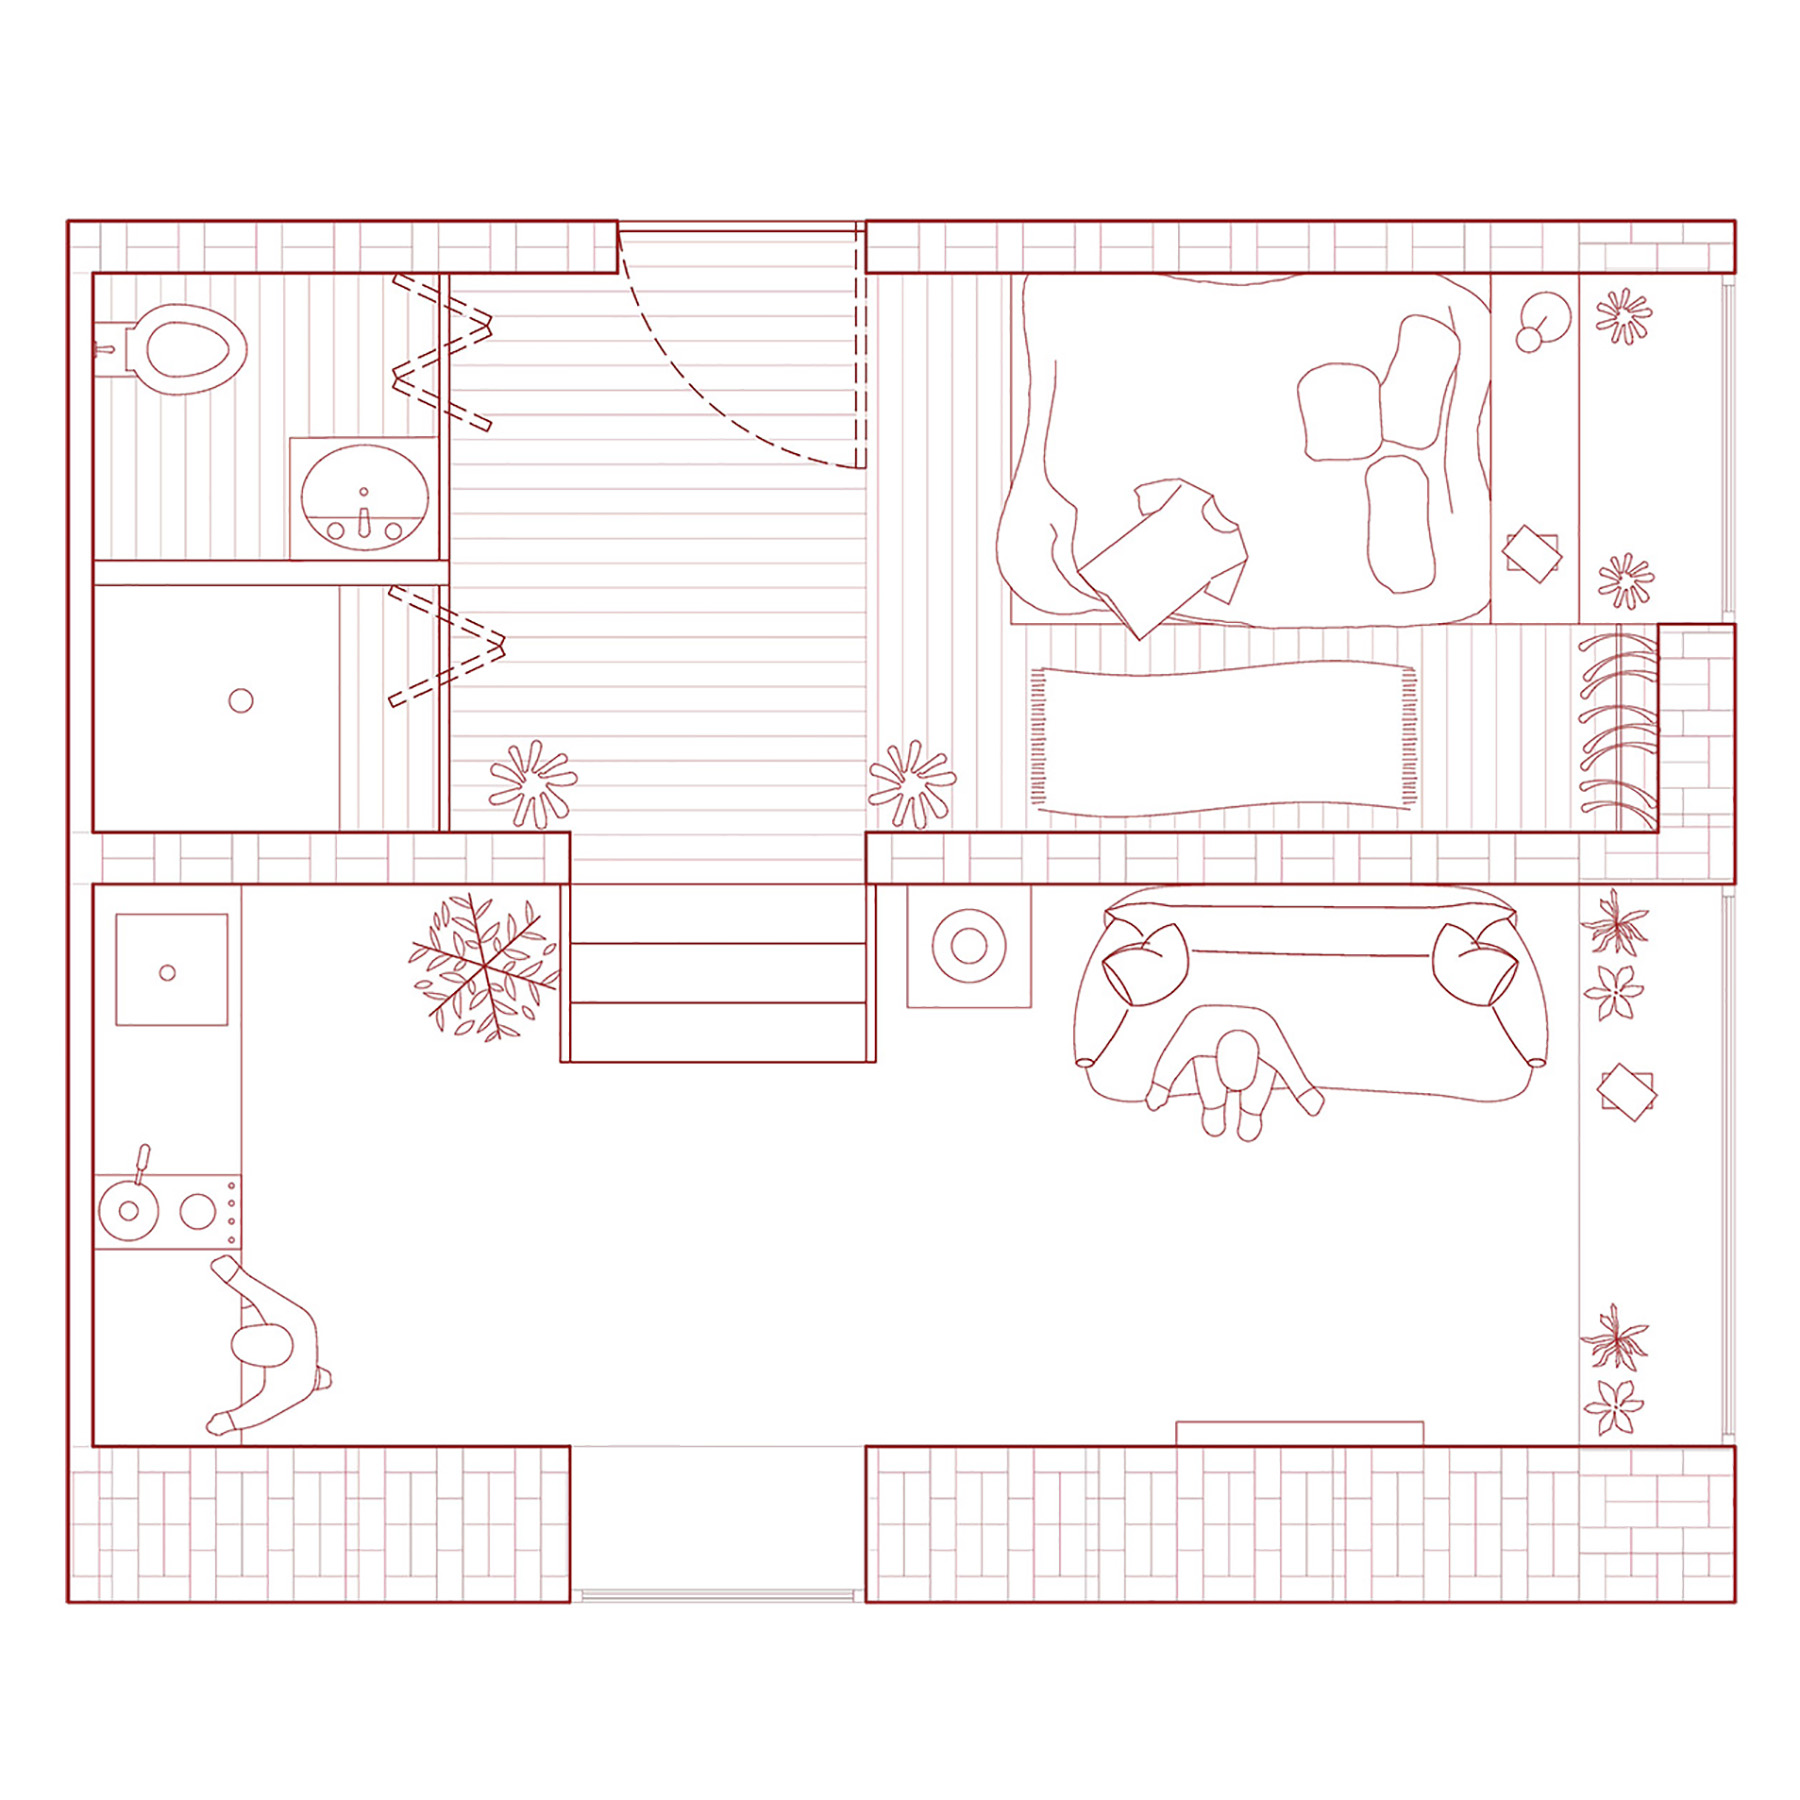 Floor plan of dwelling unit